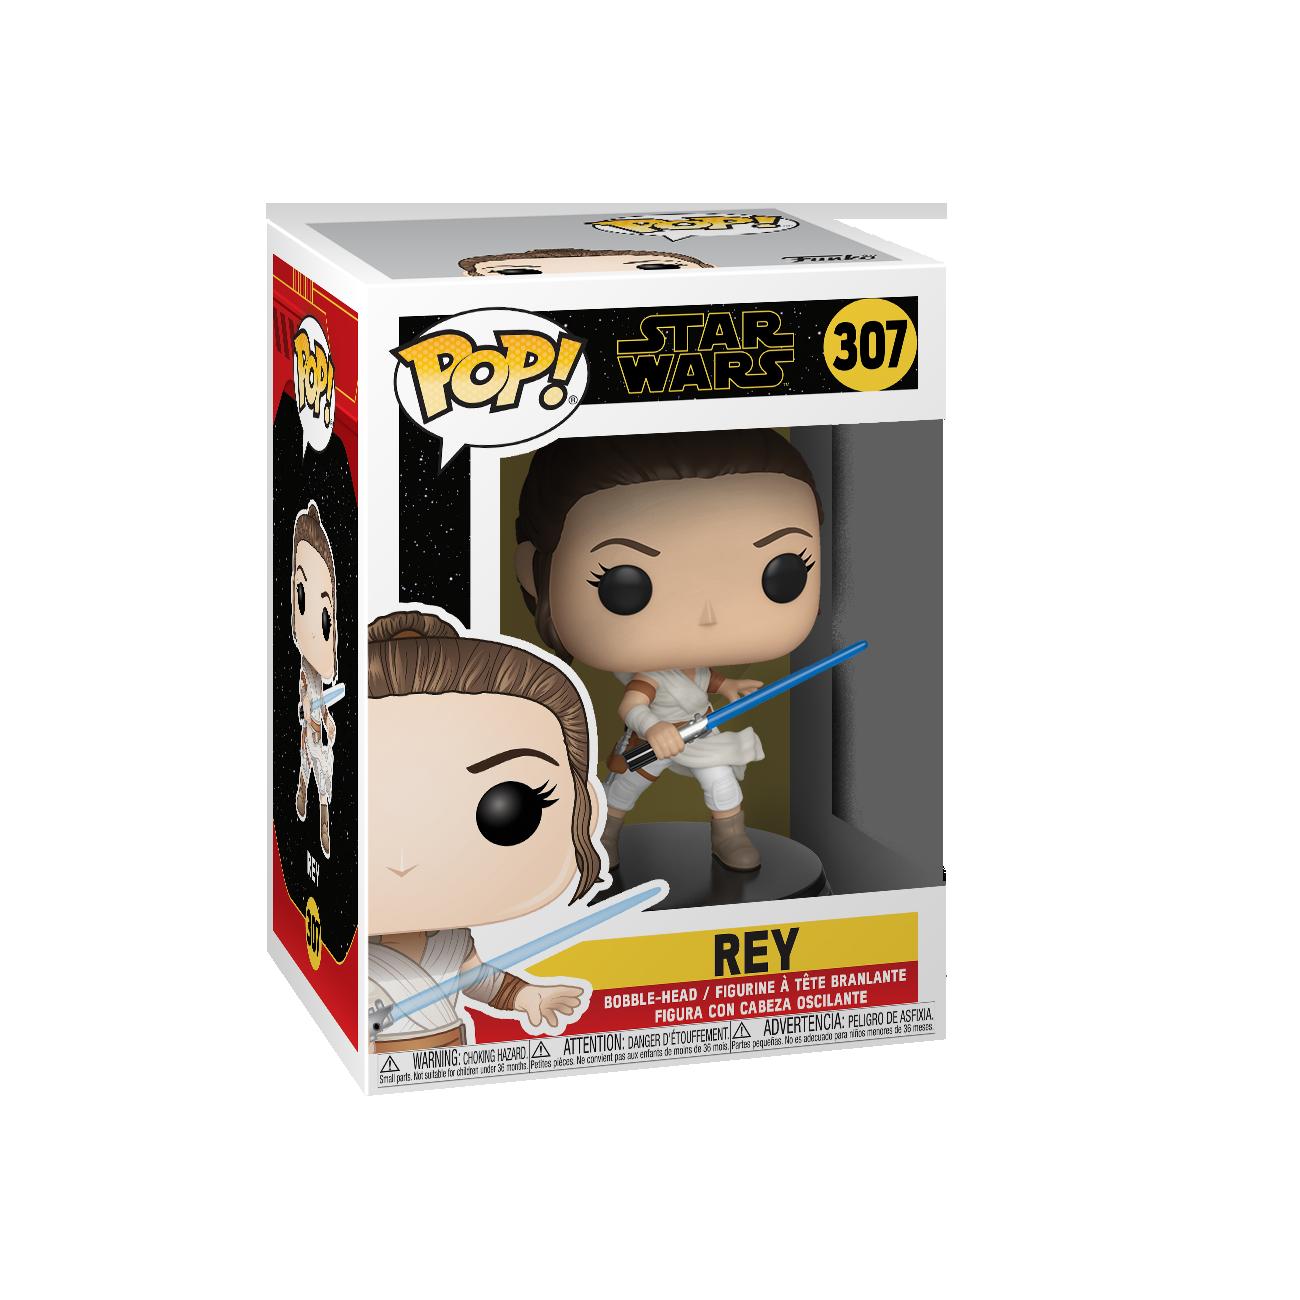 TROS FP Rey (Rey Skywalker) BH Toy 1